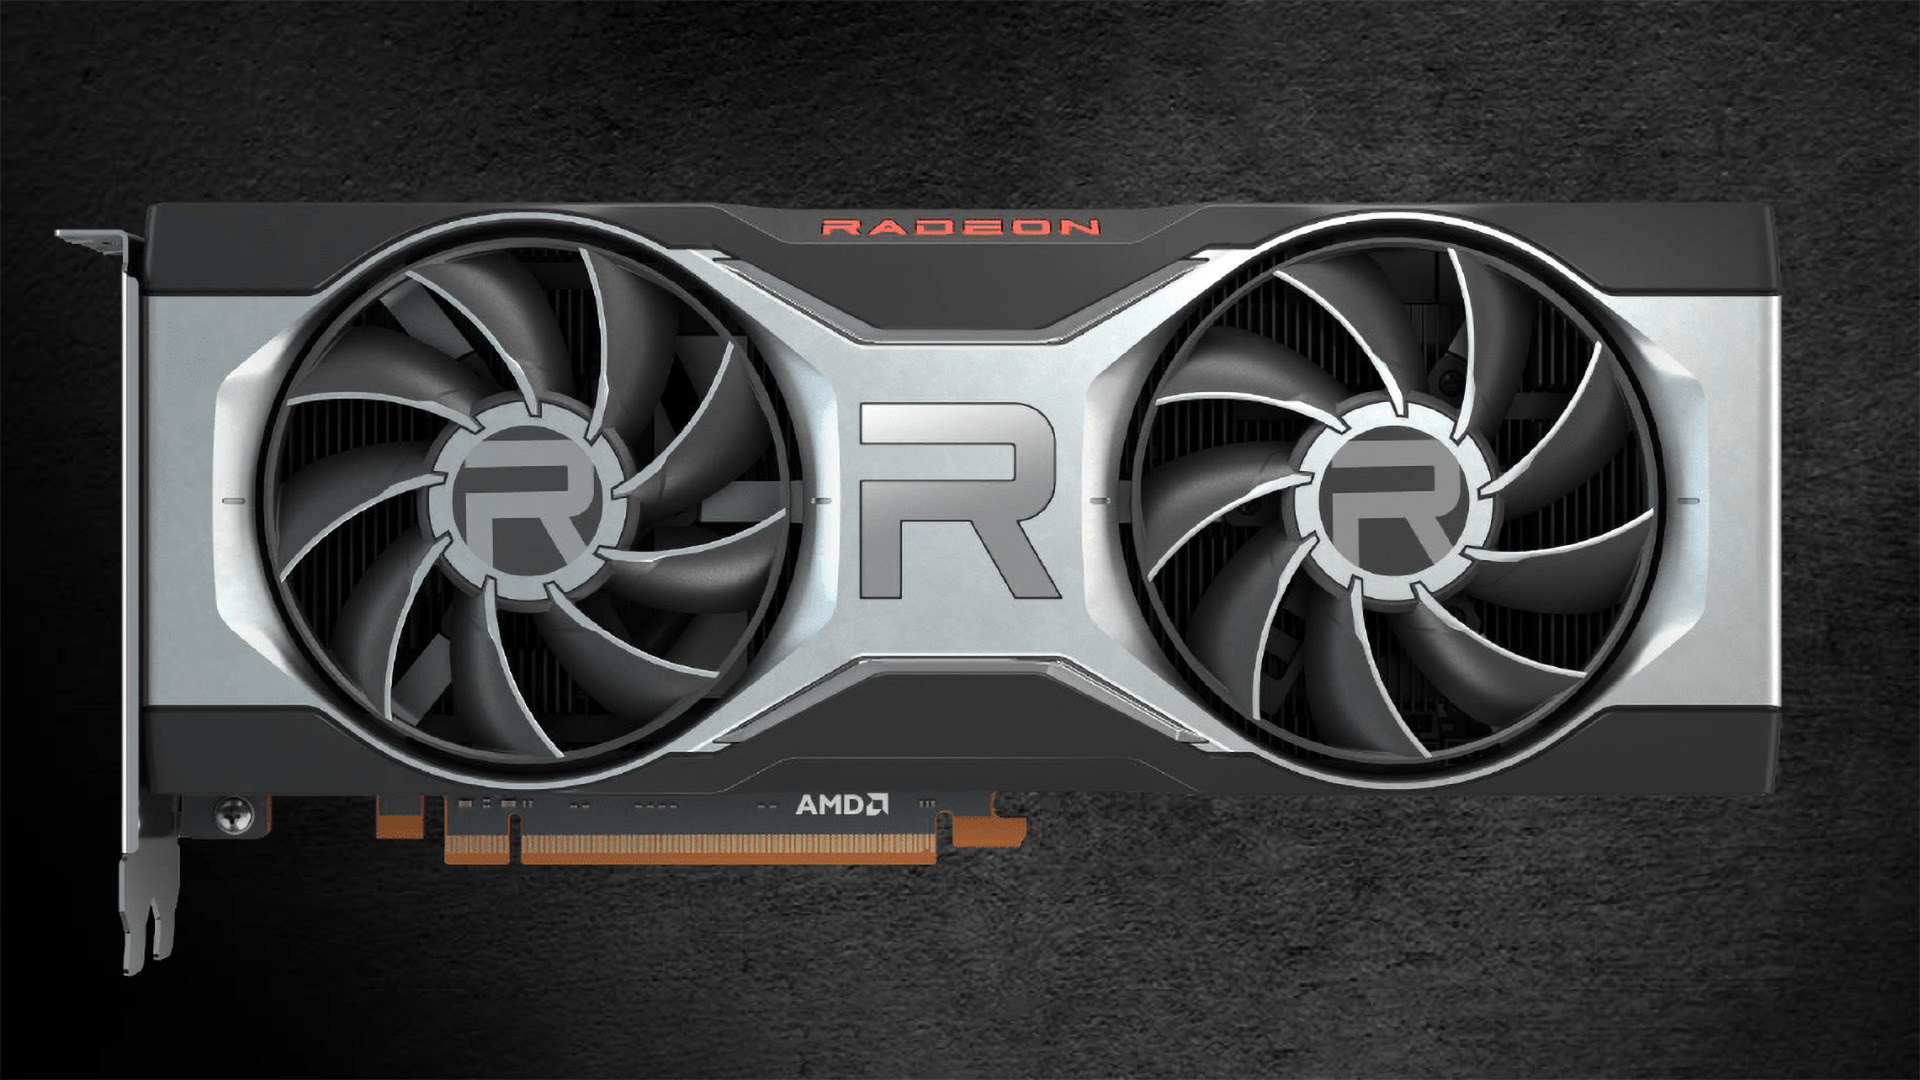 Gaming, Amd, Gpu, Grafikkarte, Radeon RX 6700 XT, Navi 22